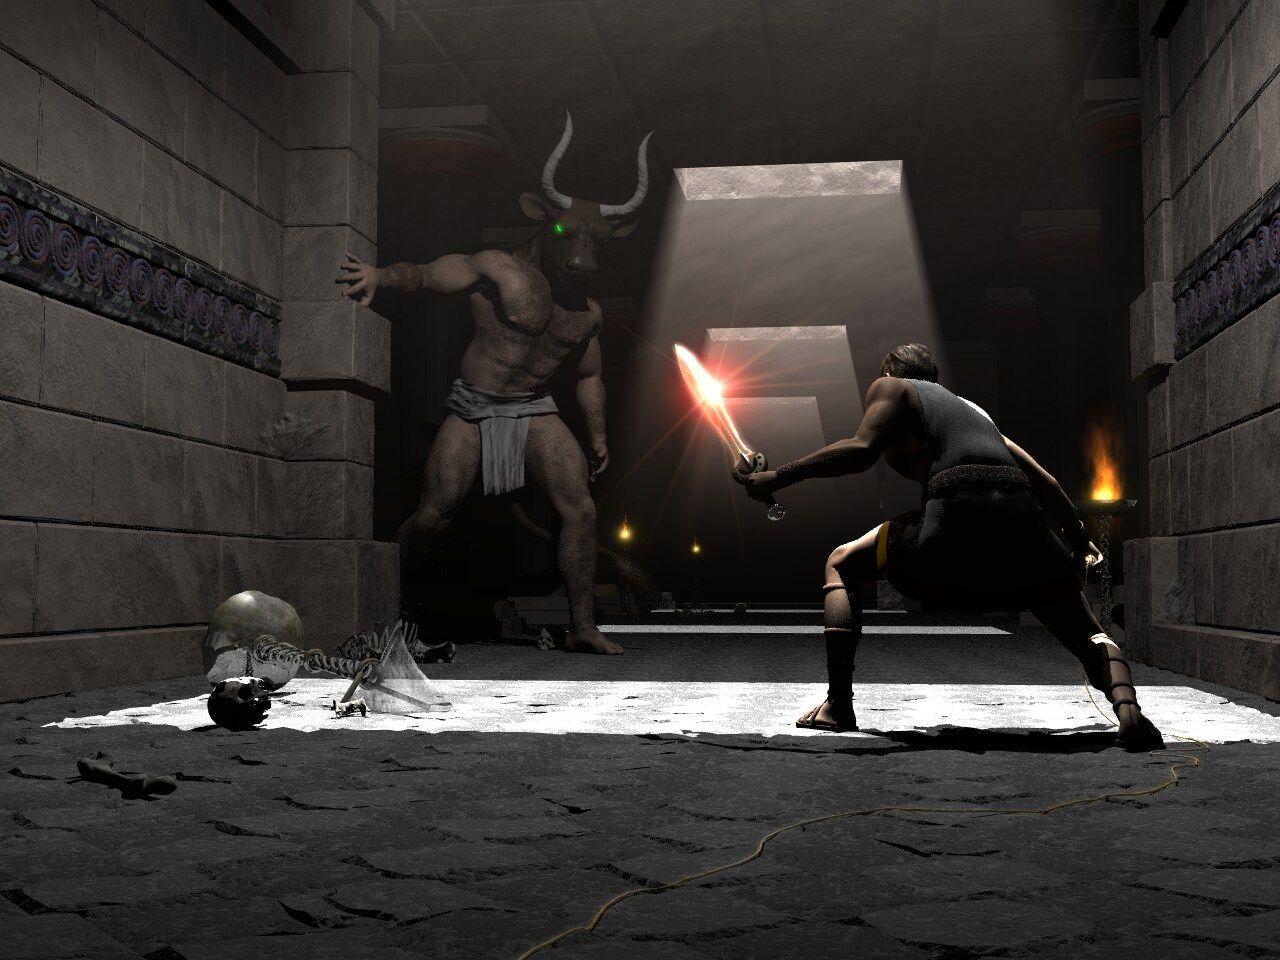 Minotaur xxx games naked scene